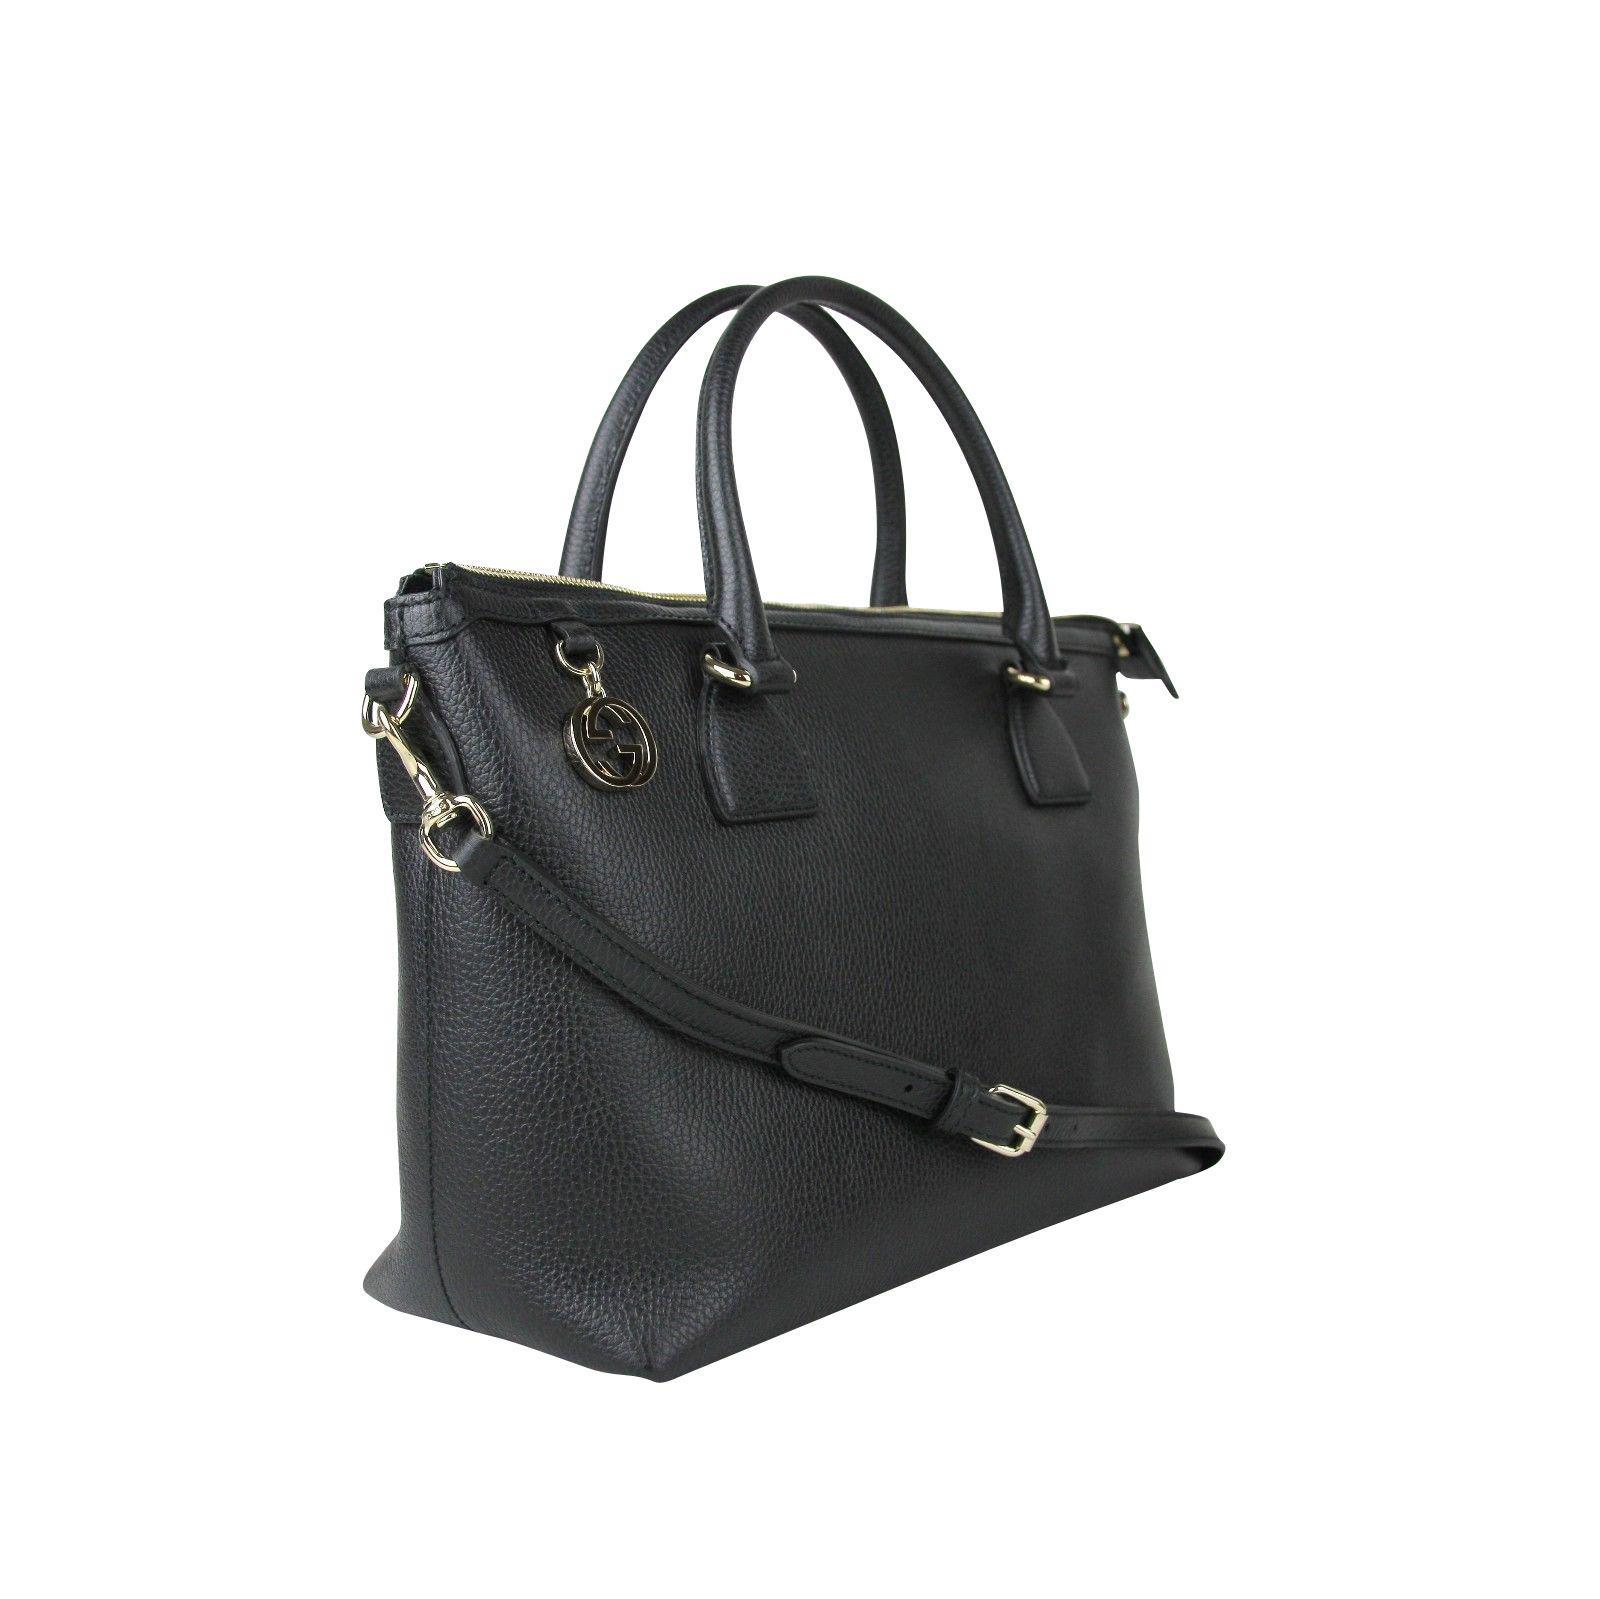 7aa3384ba3d9 Lyst - Gucci GG Charm Black Leather Medium Convertible Straight Bag ...